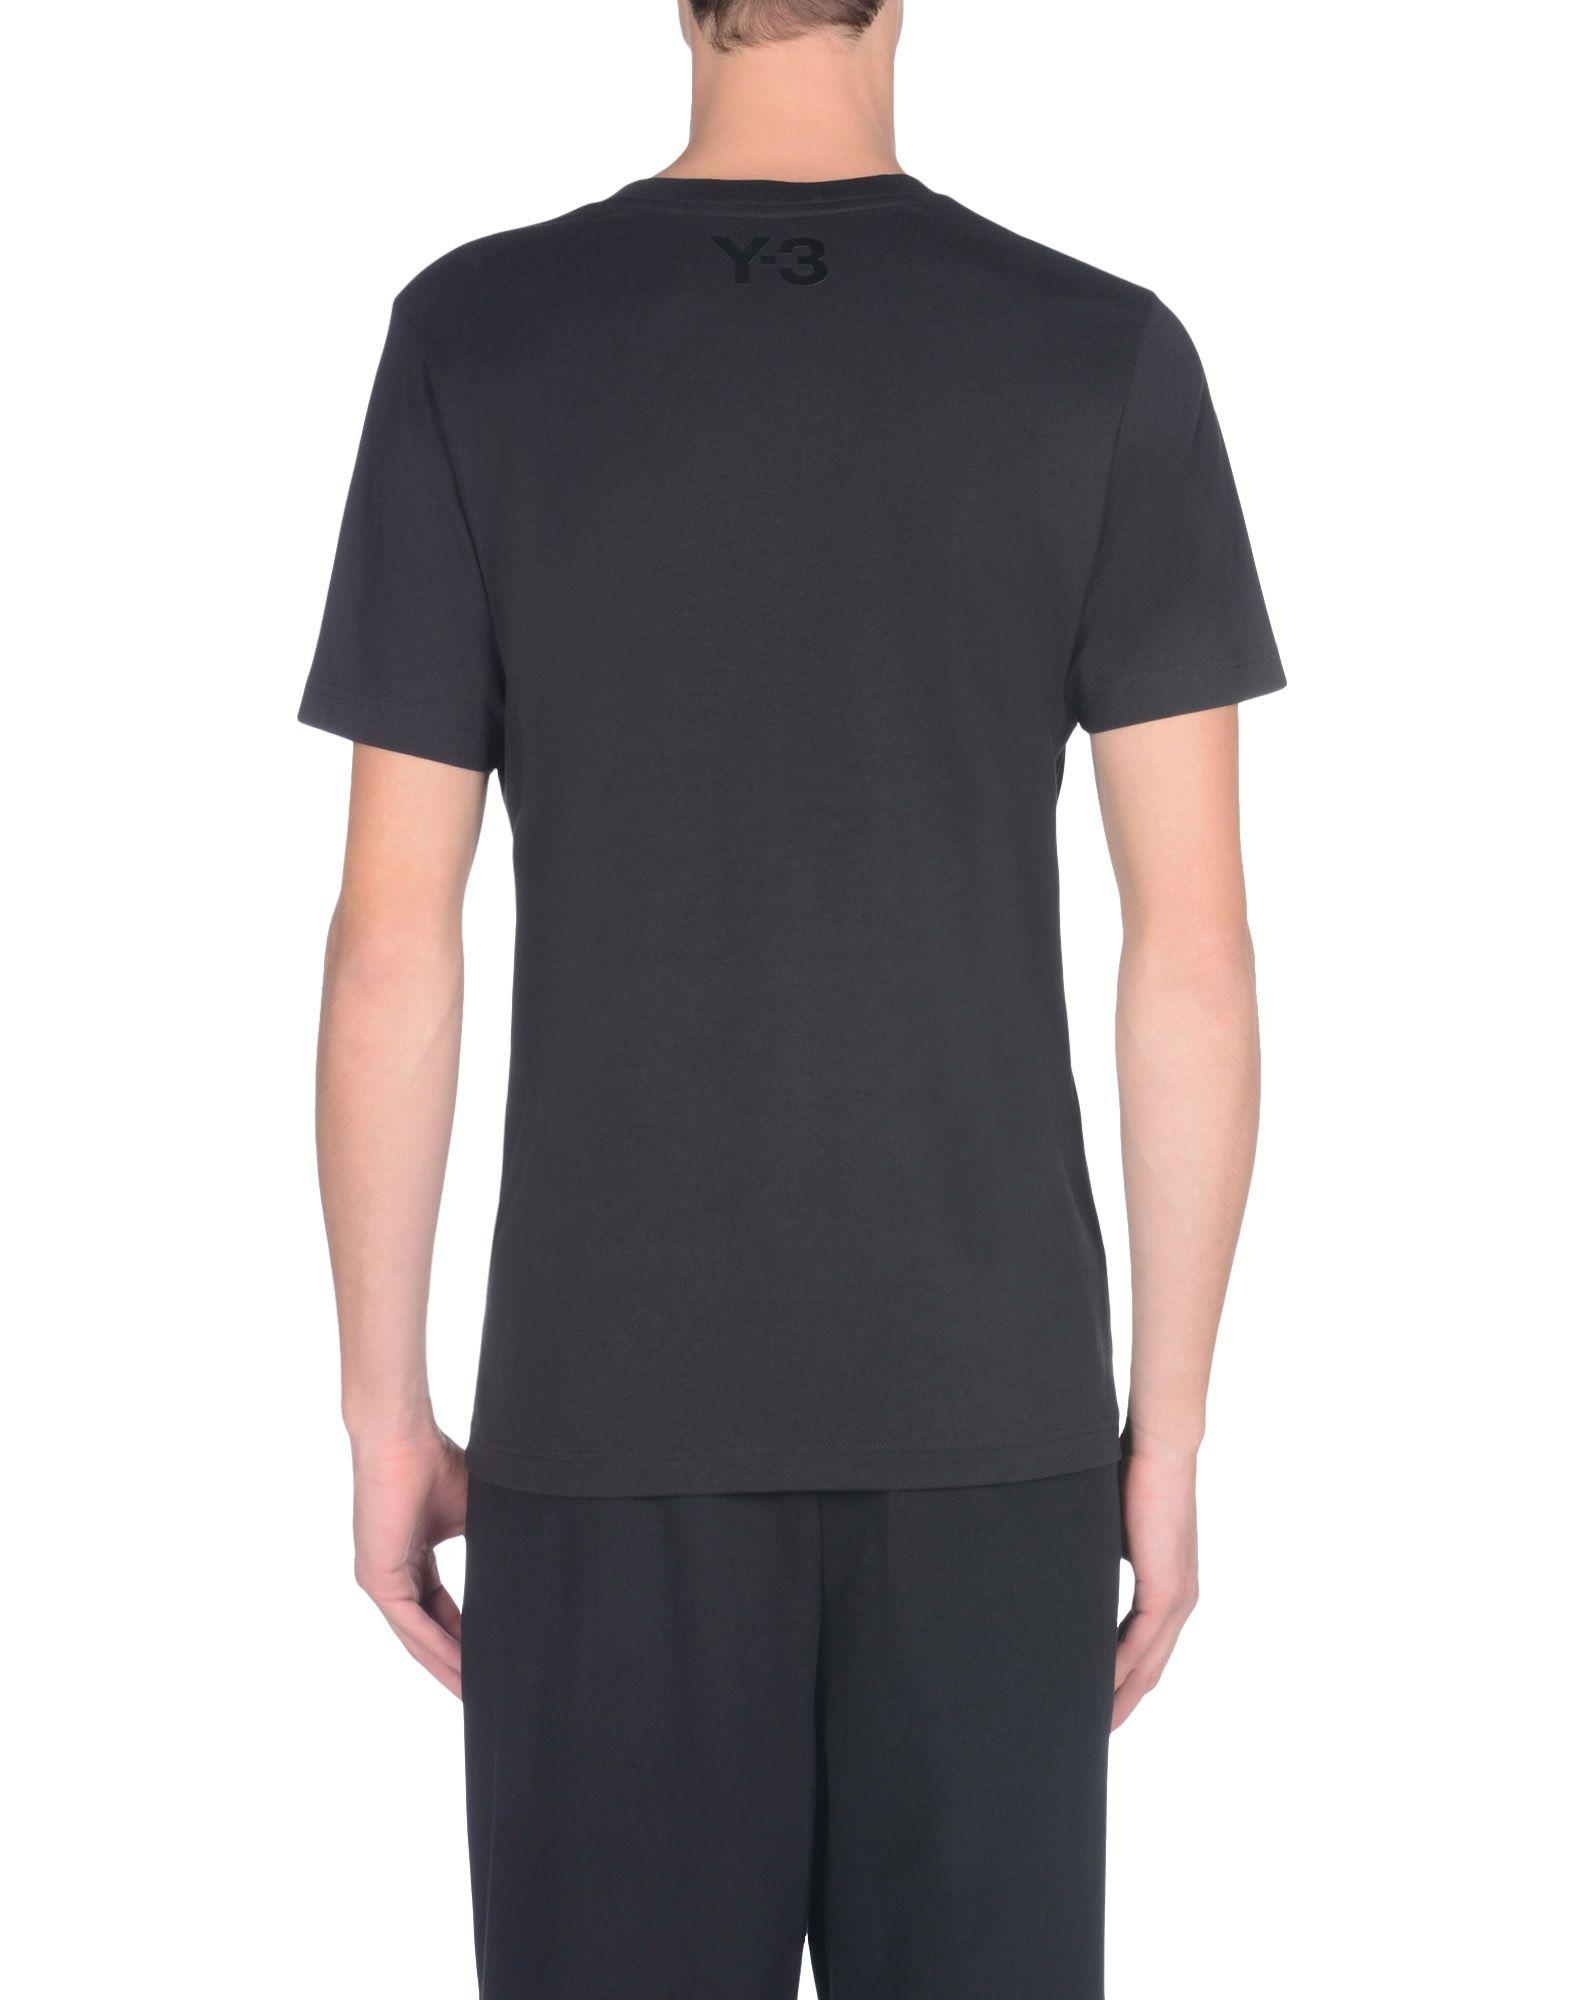 adidas v neck t shirt